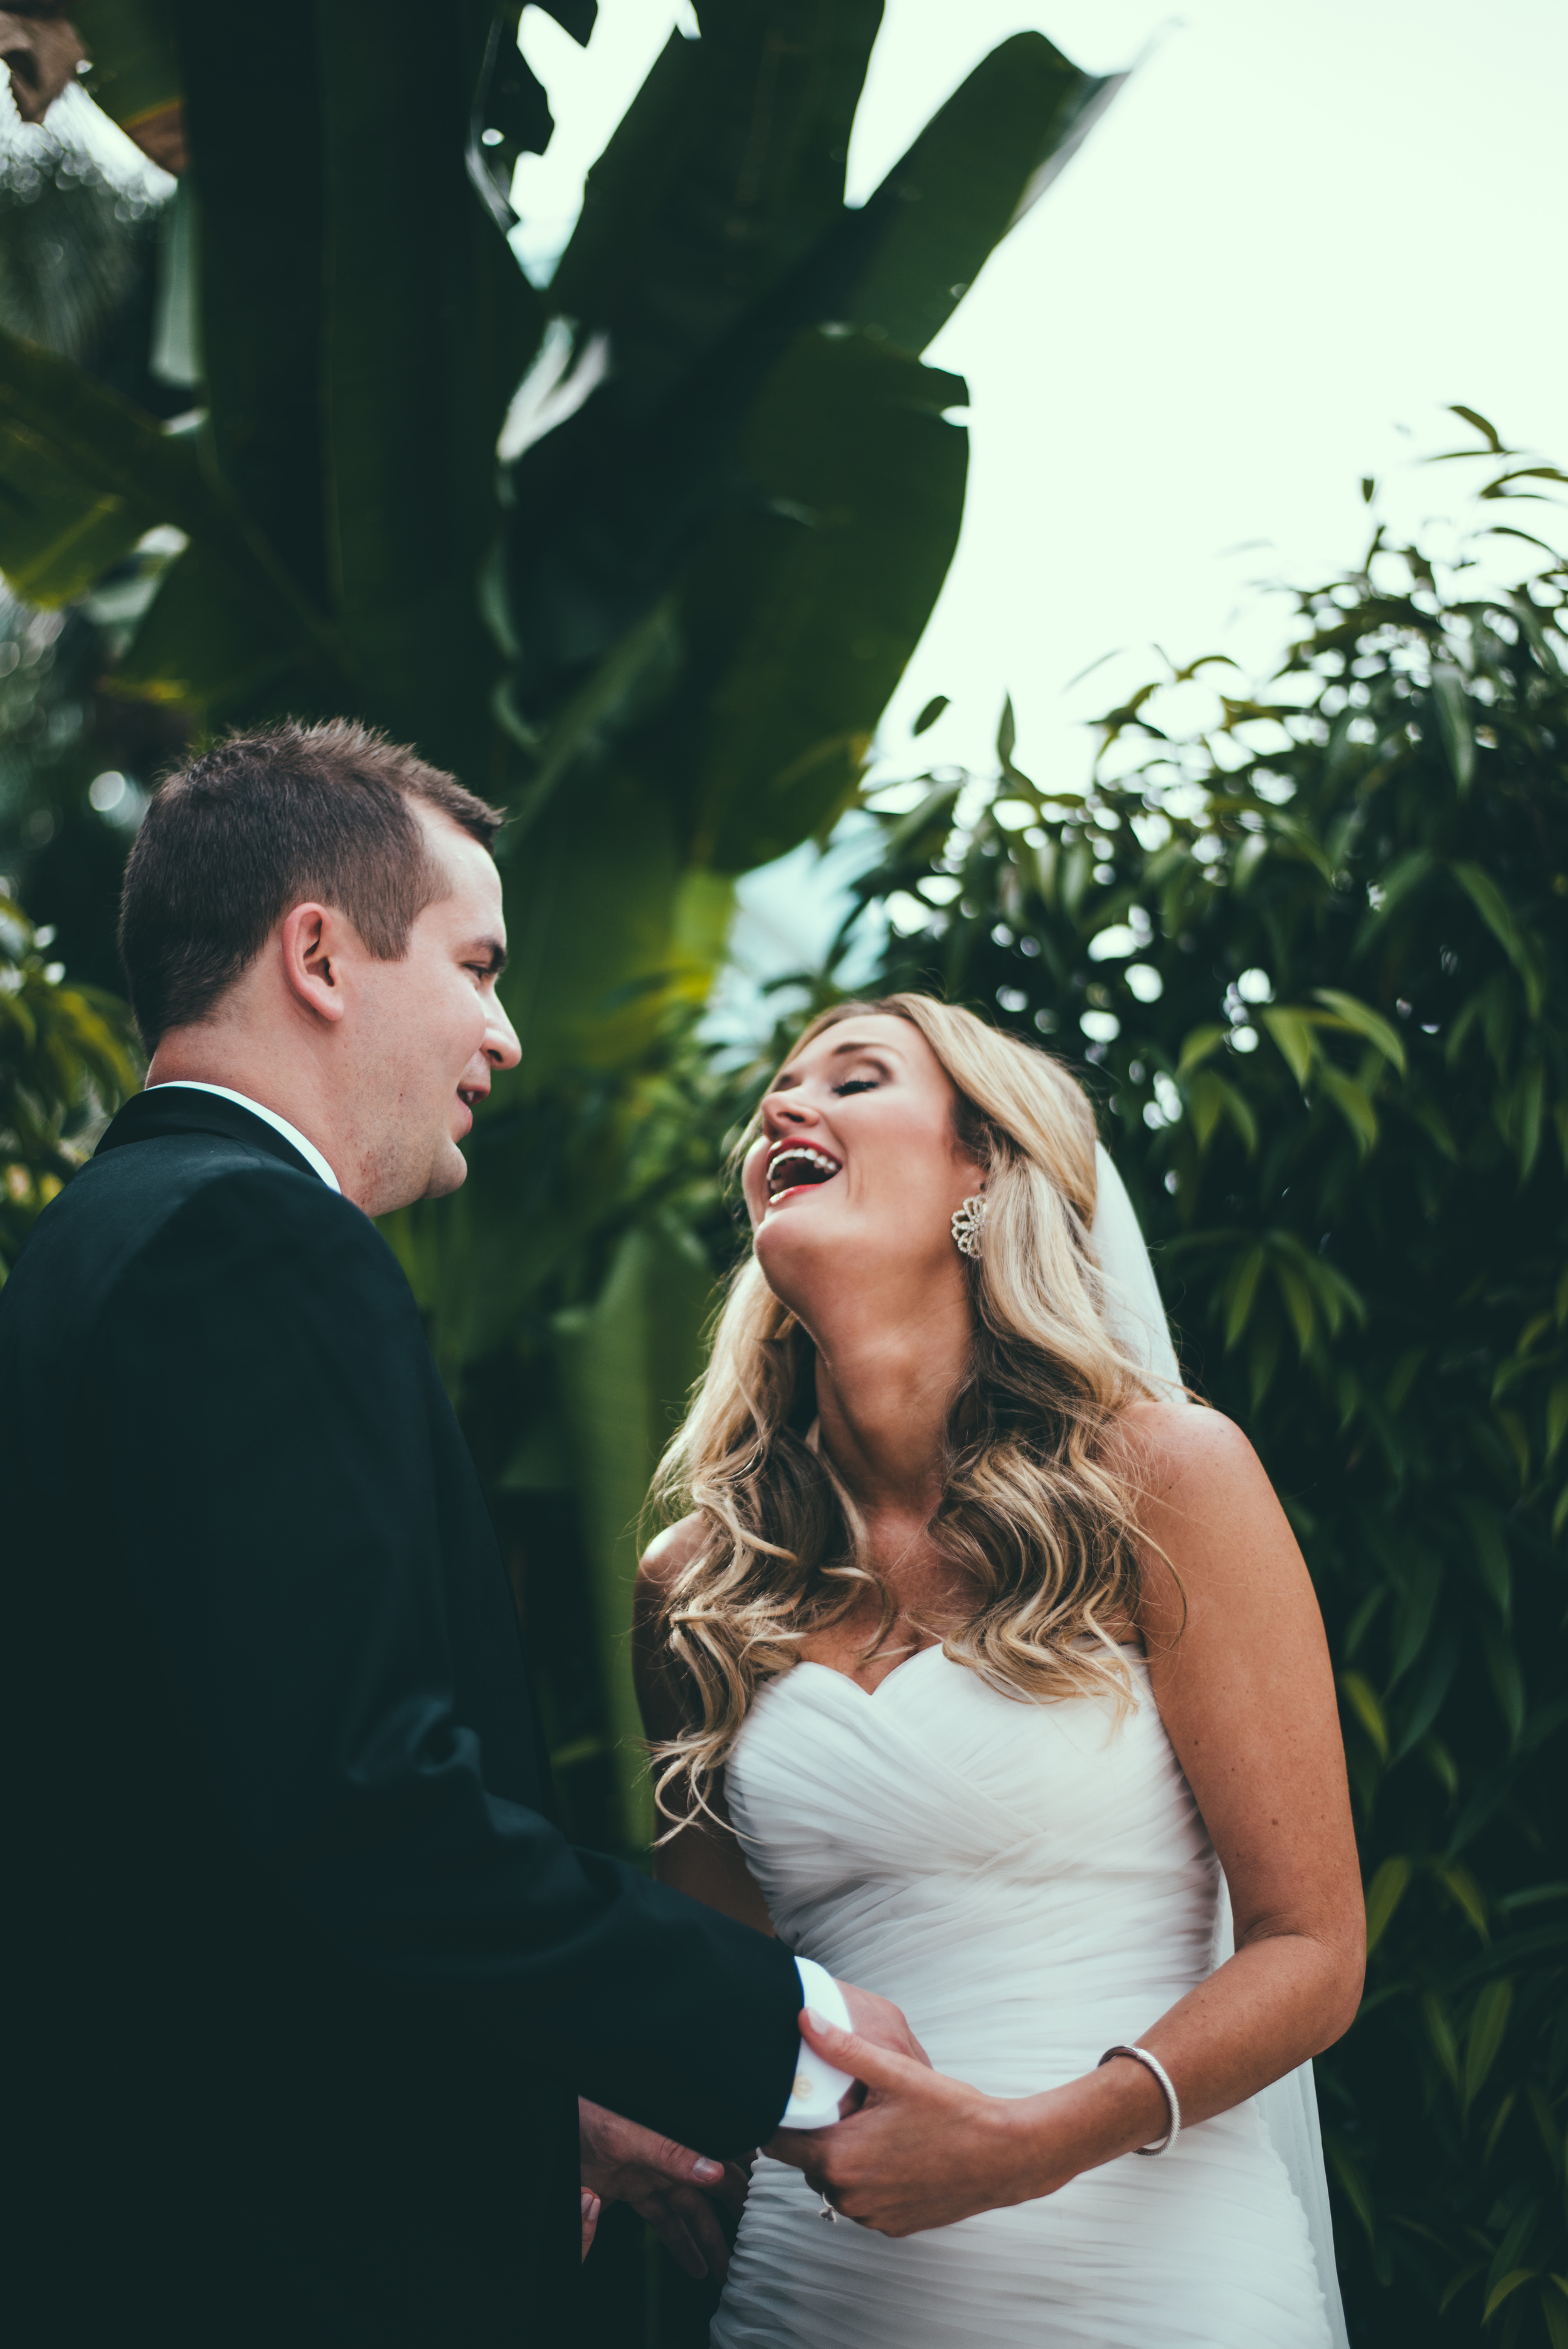 The Palms Hotel & Spa Wedding Miami Florida Photographer Bride Laughing at Grooms joke